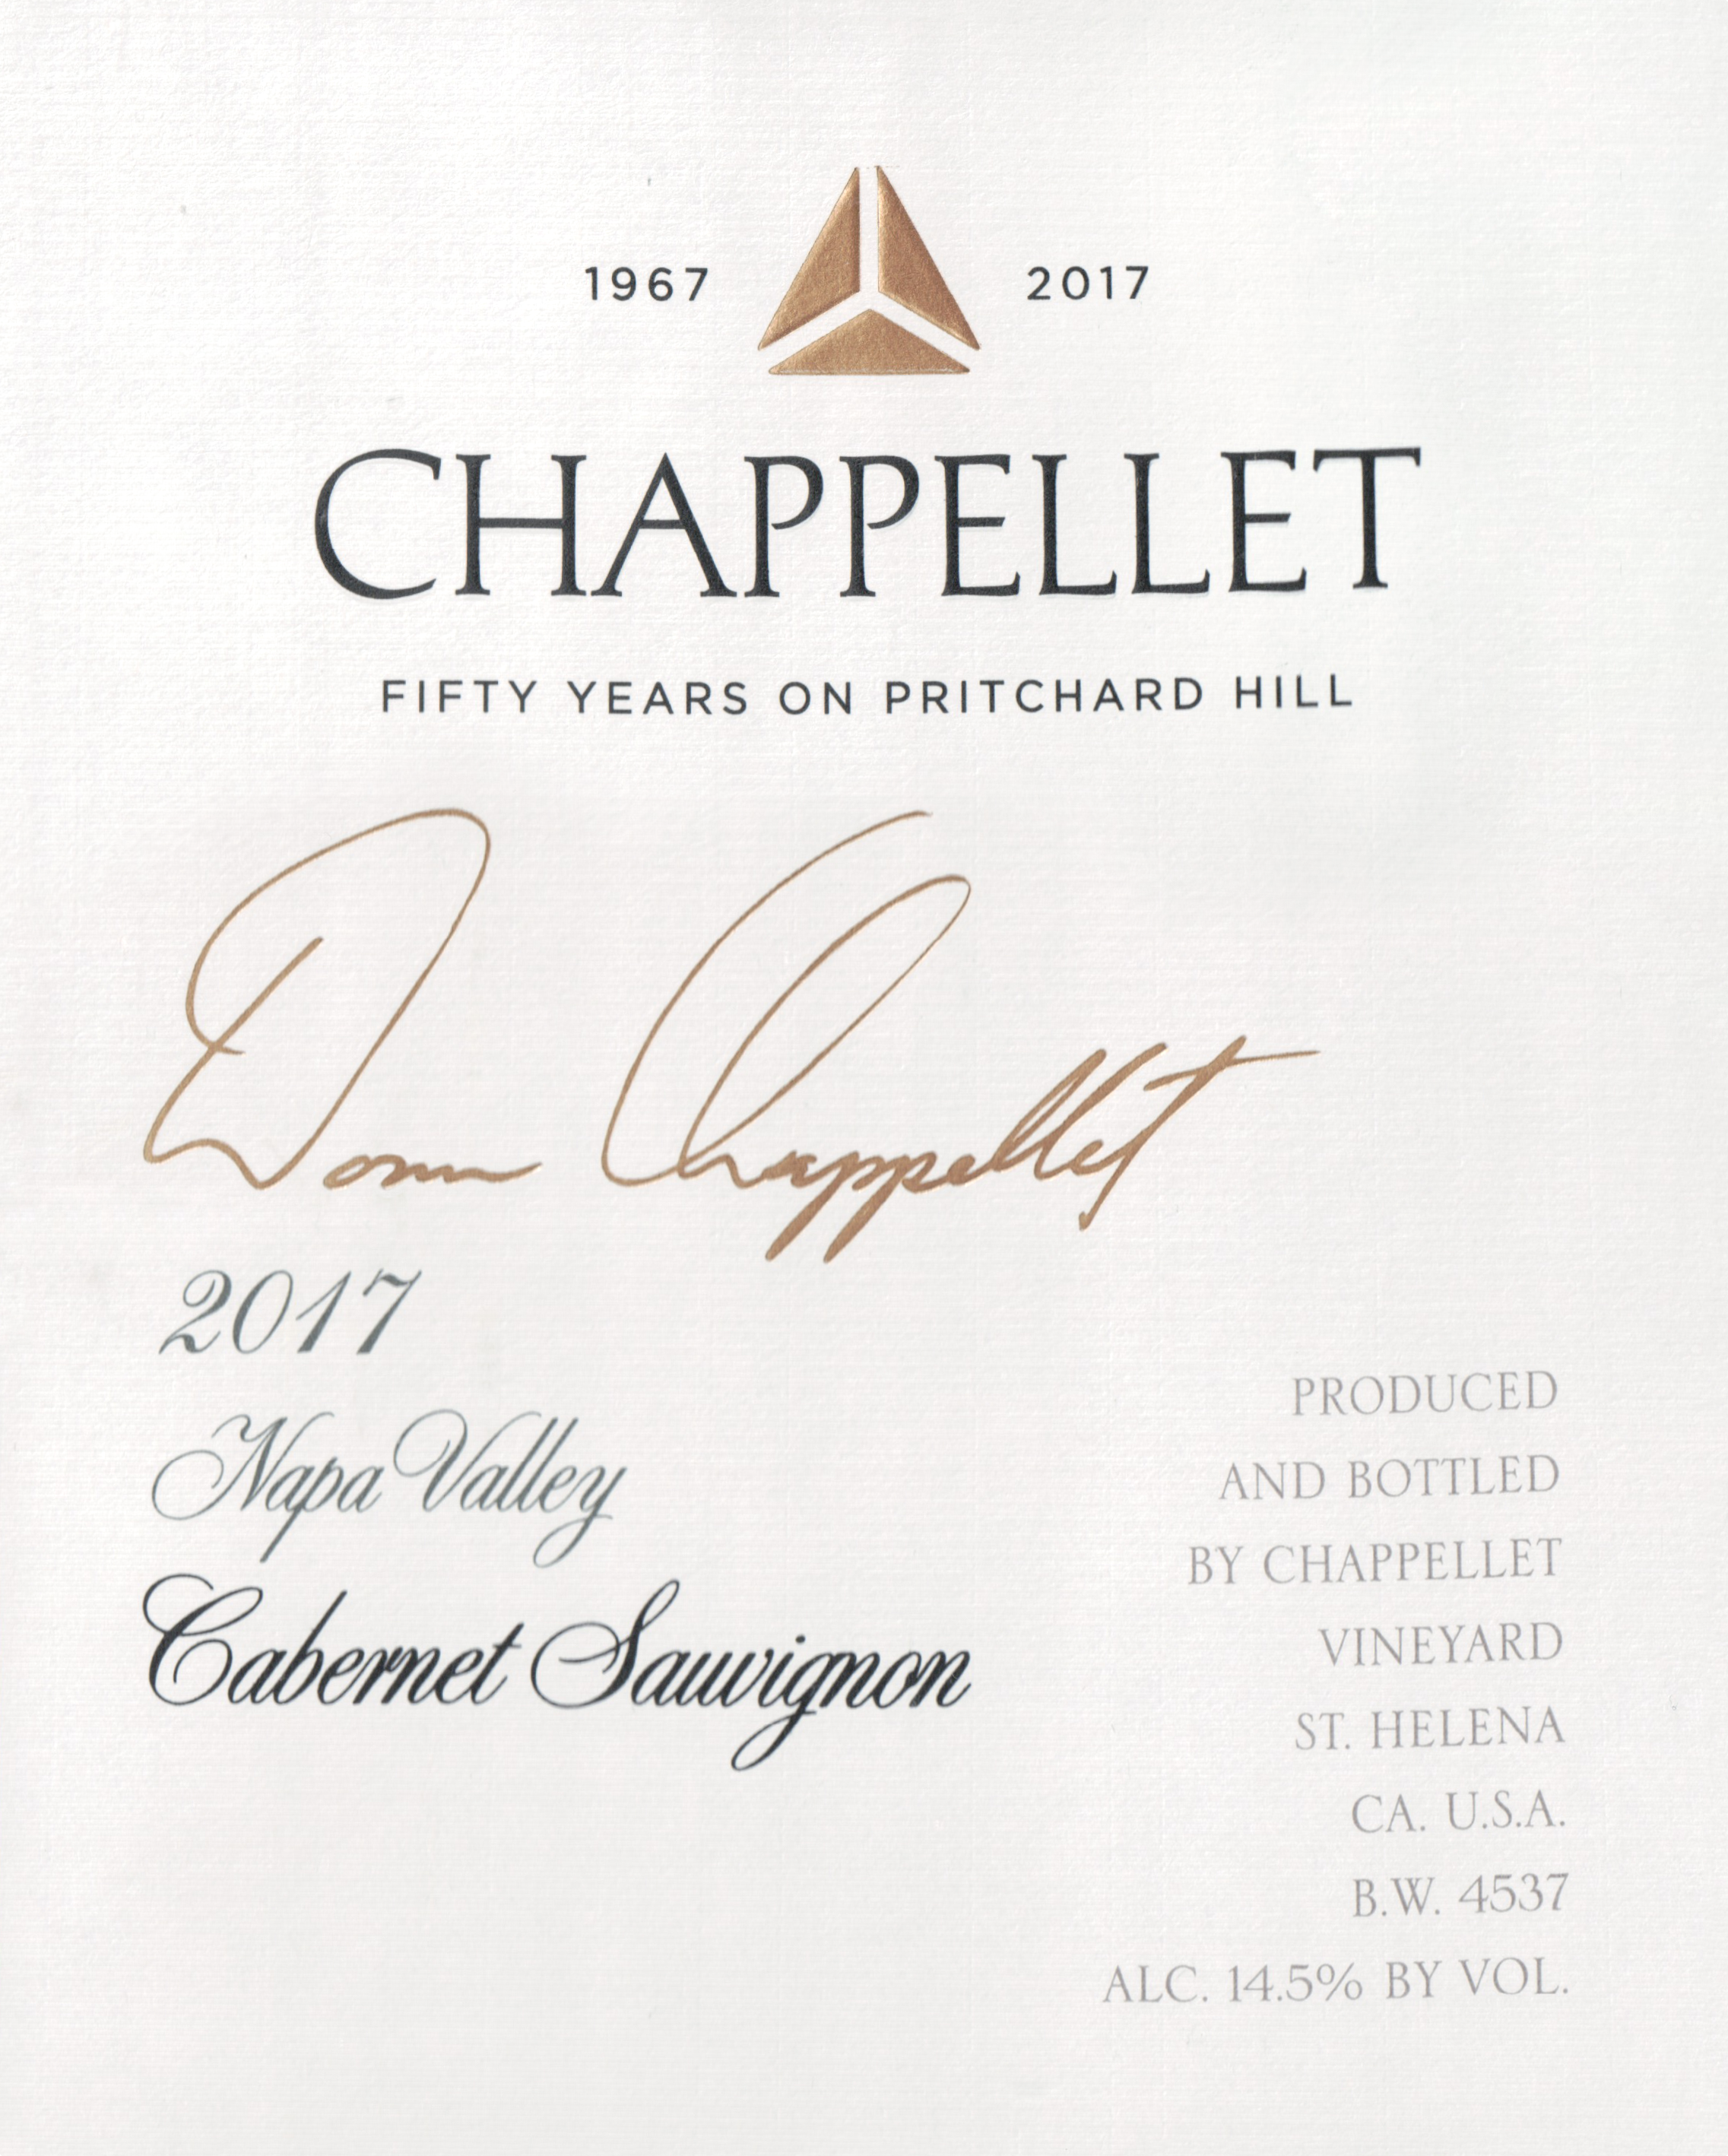 Chappellet Signature Napa Cabernet Sauvignon 2017